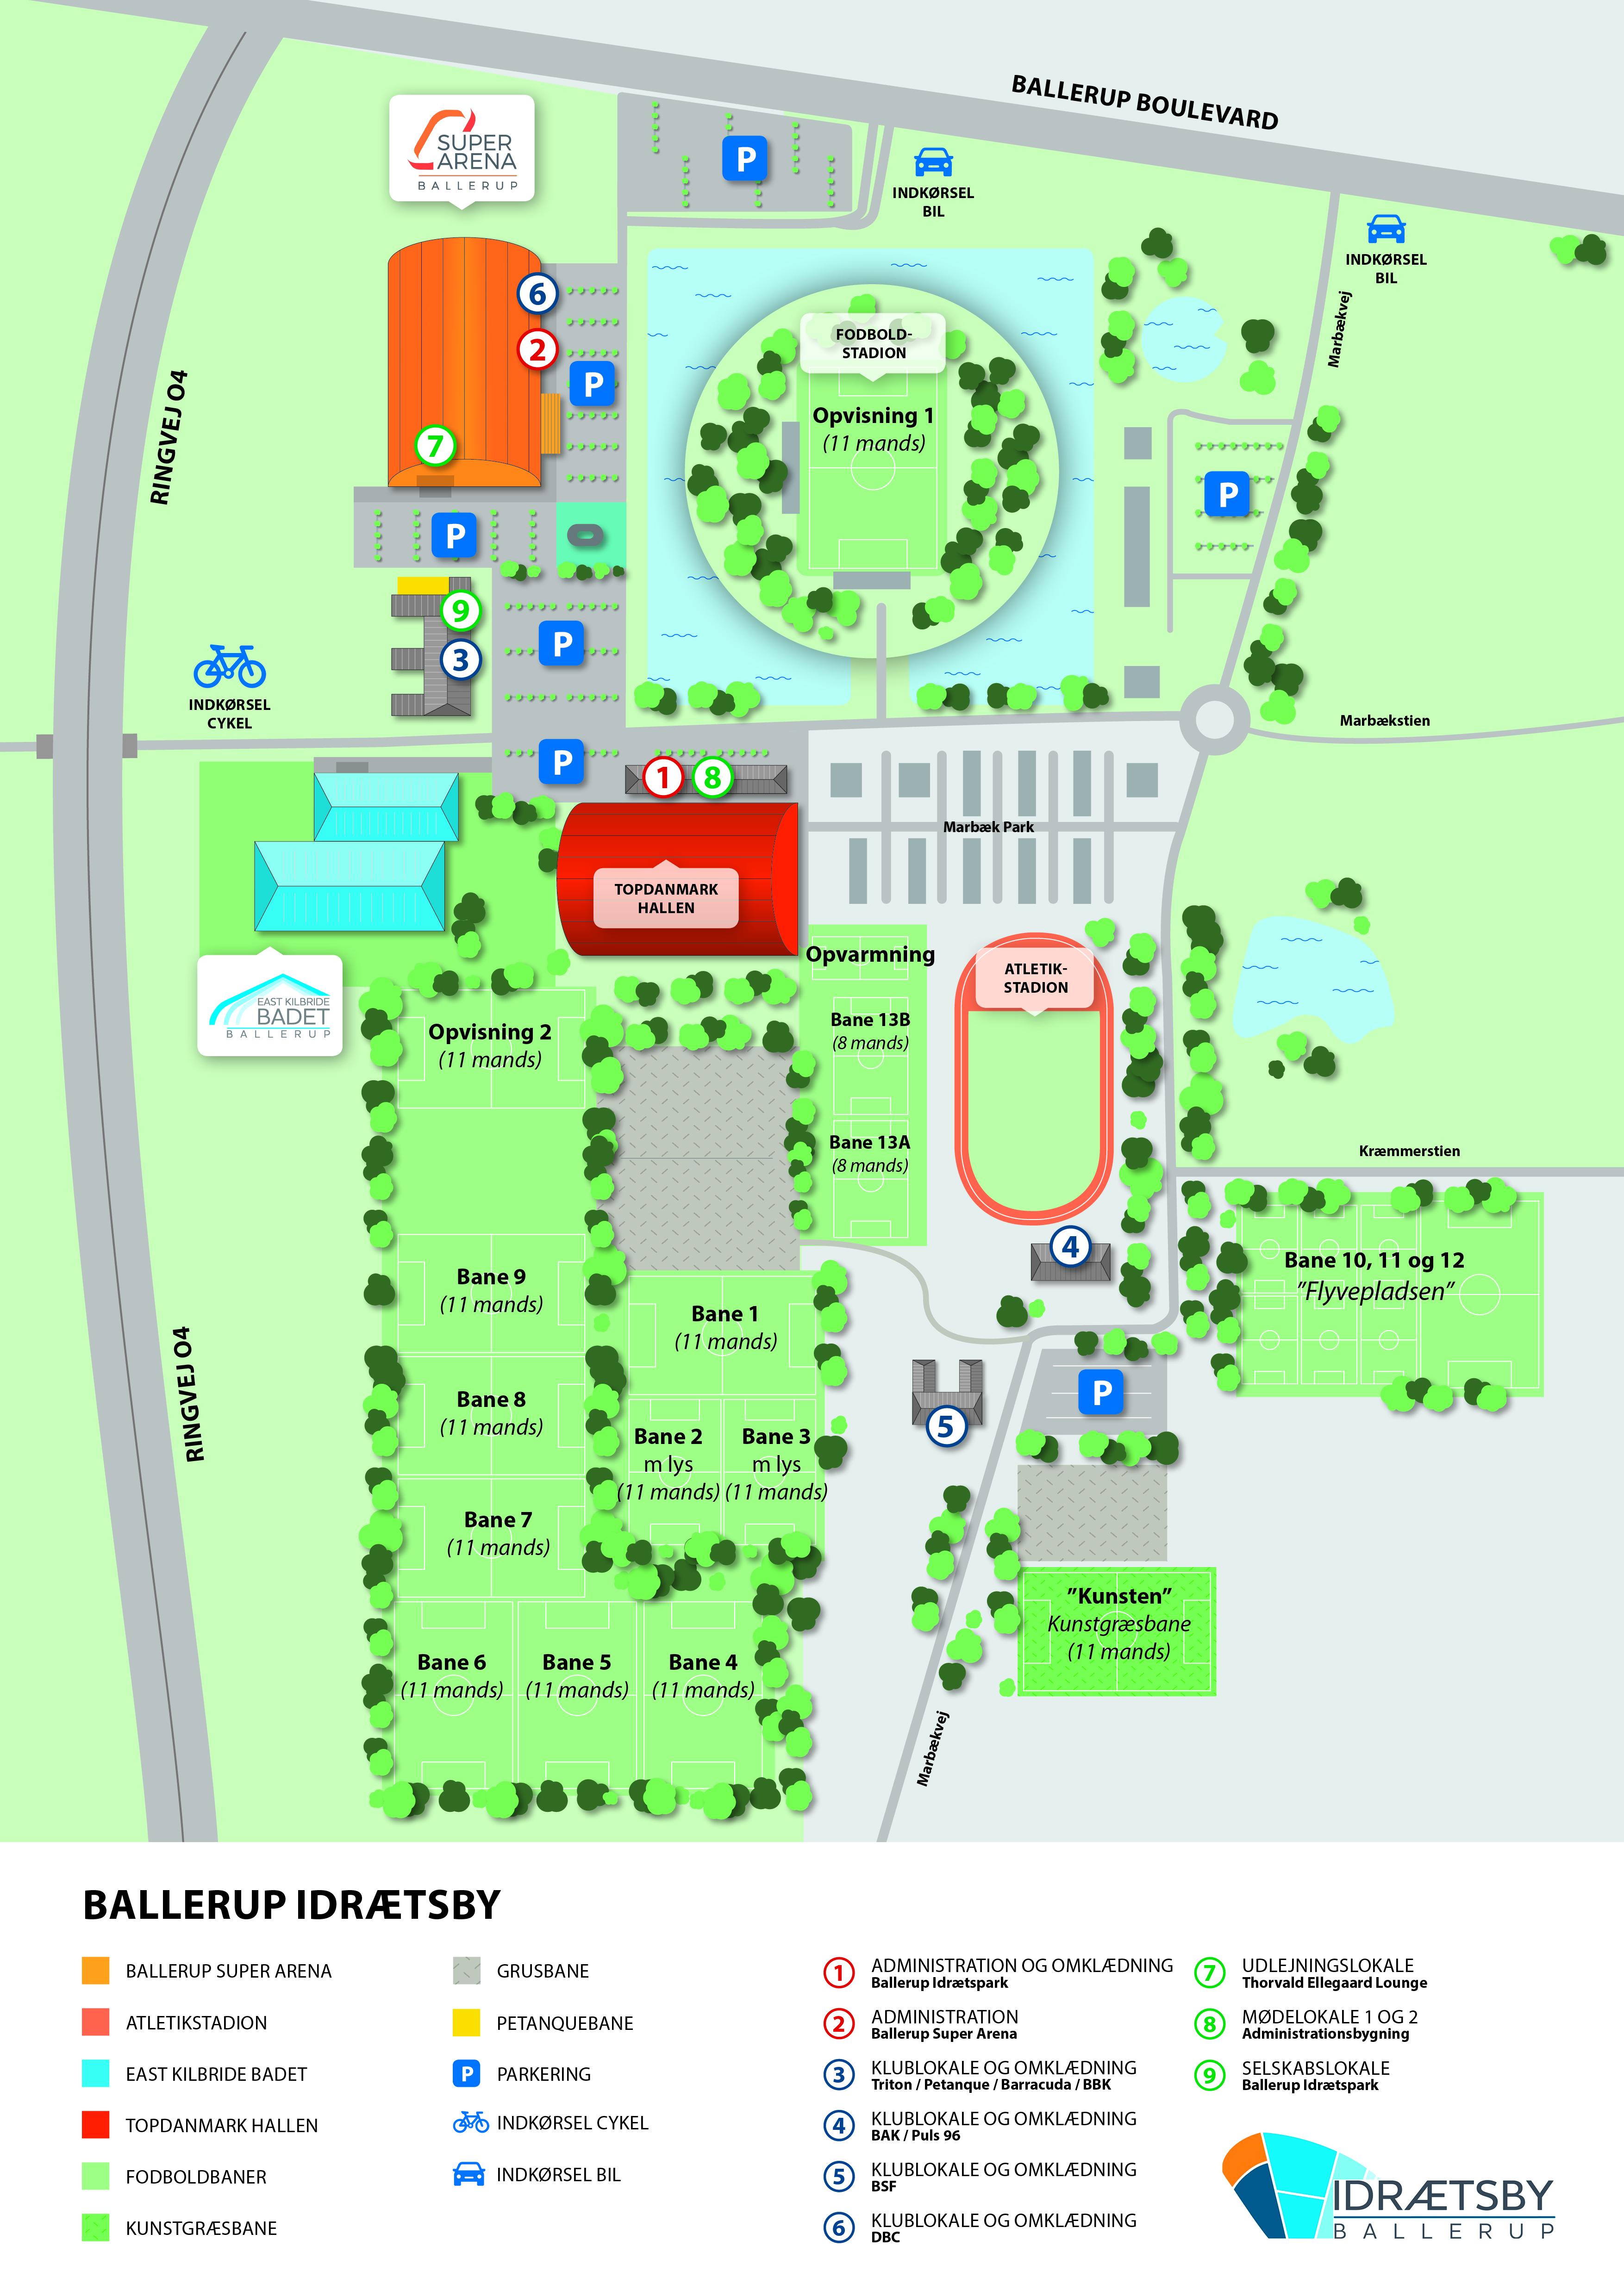 Kort Forboldbaneoversigt I Ballerup Idraetsby